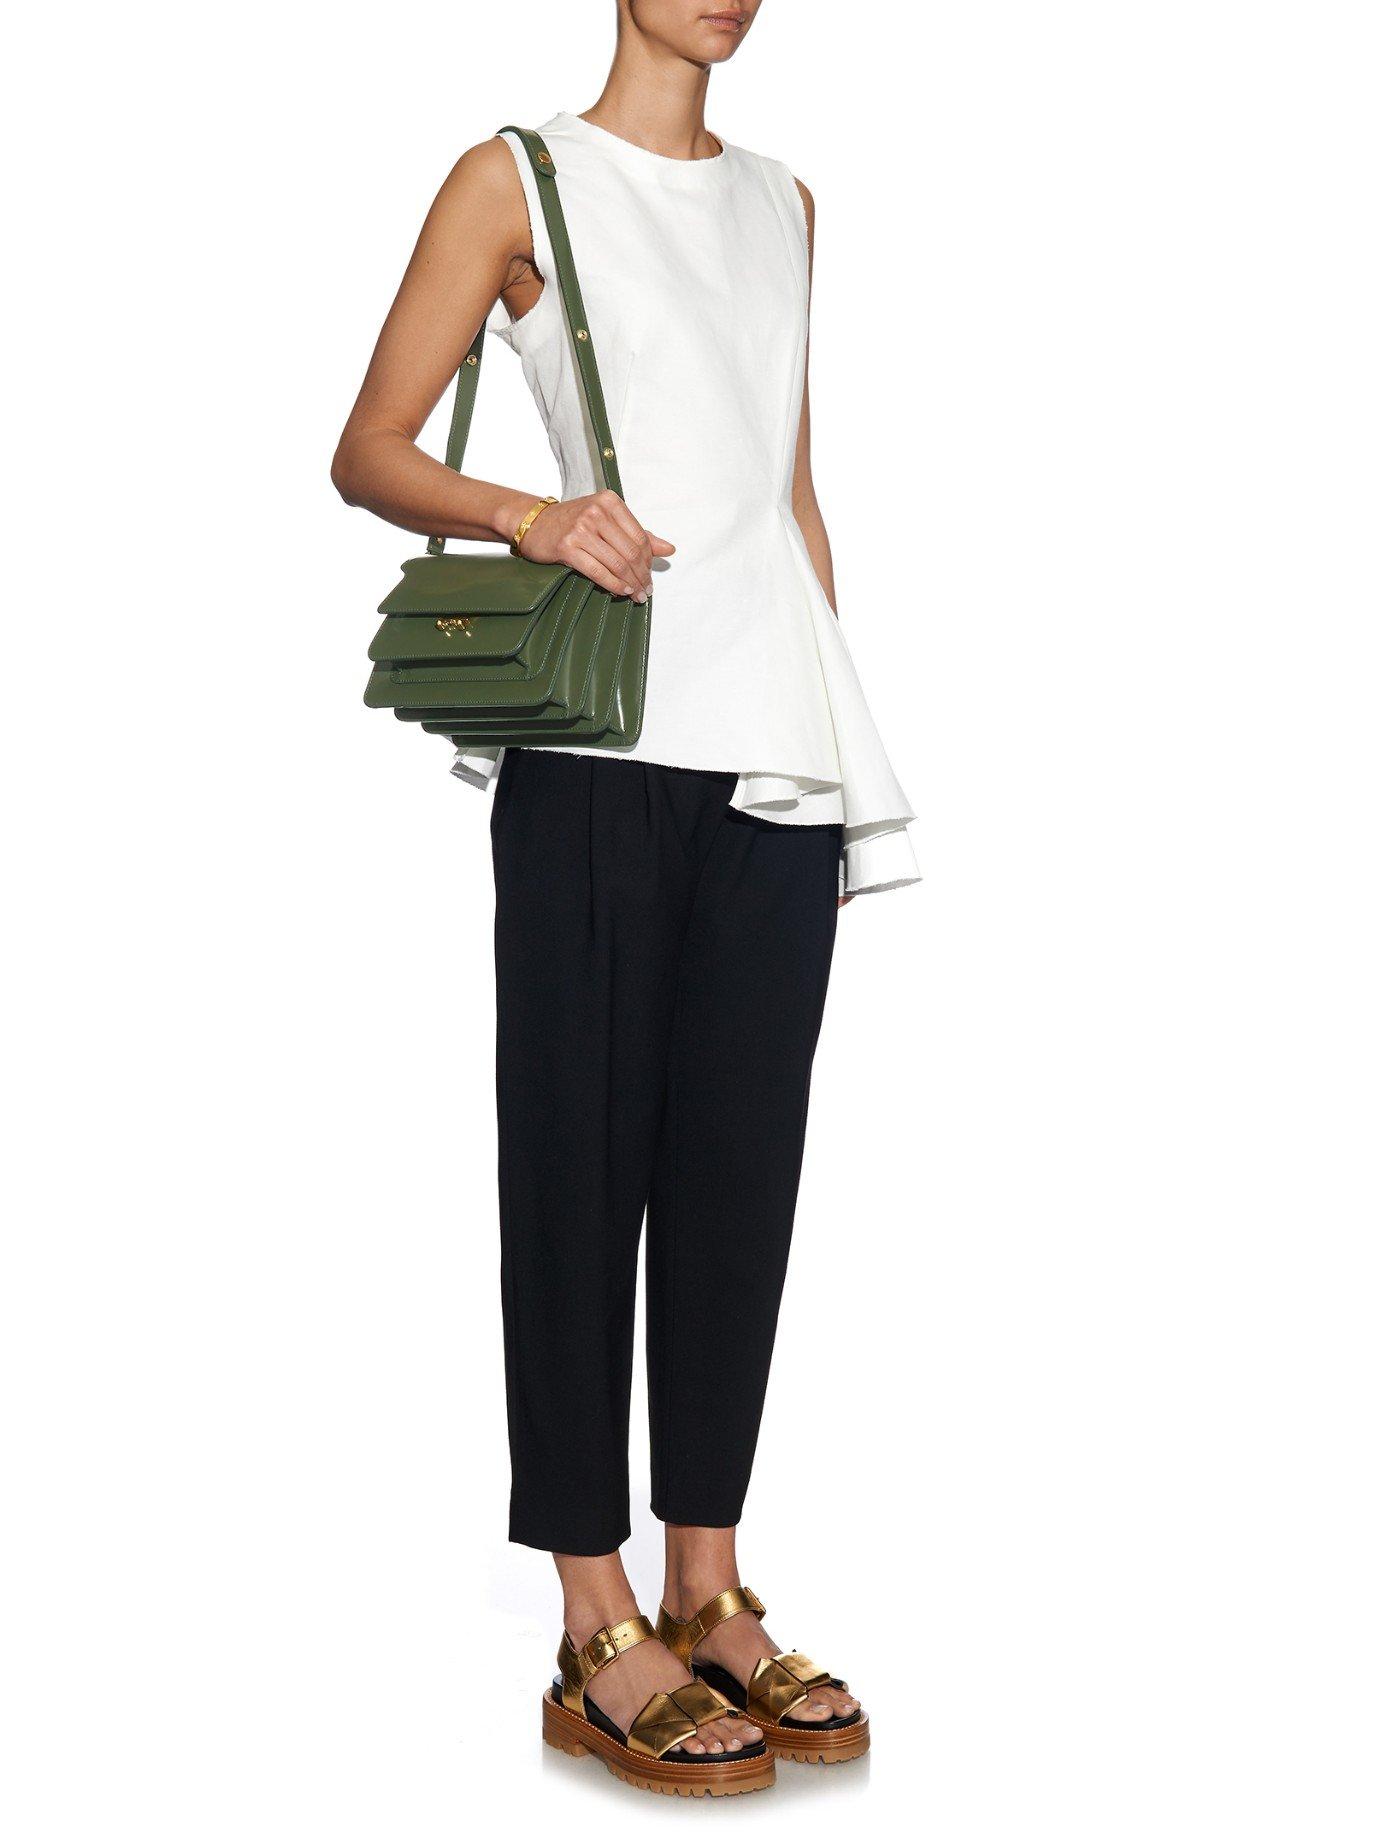 Marni Trunk Medium Leather Shoulder Bag in Green